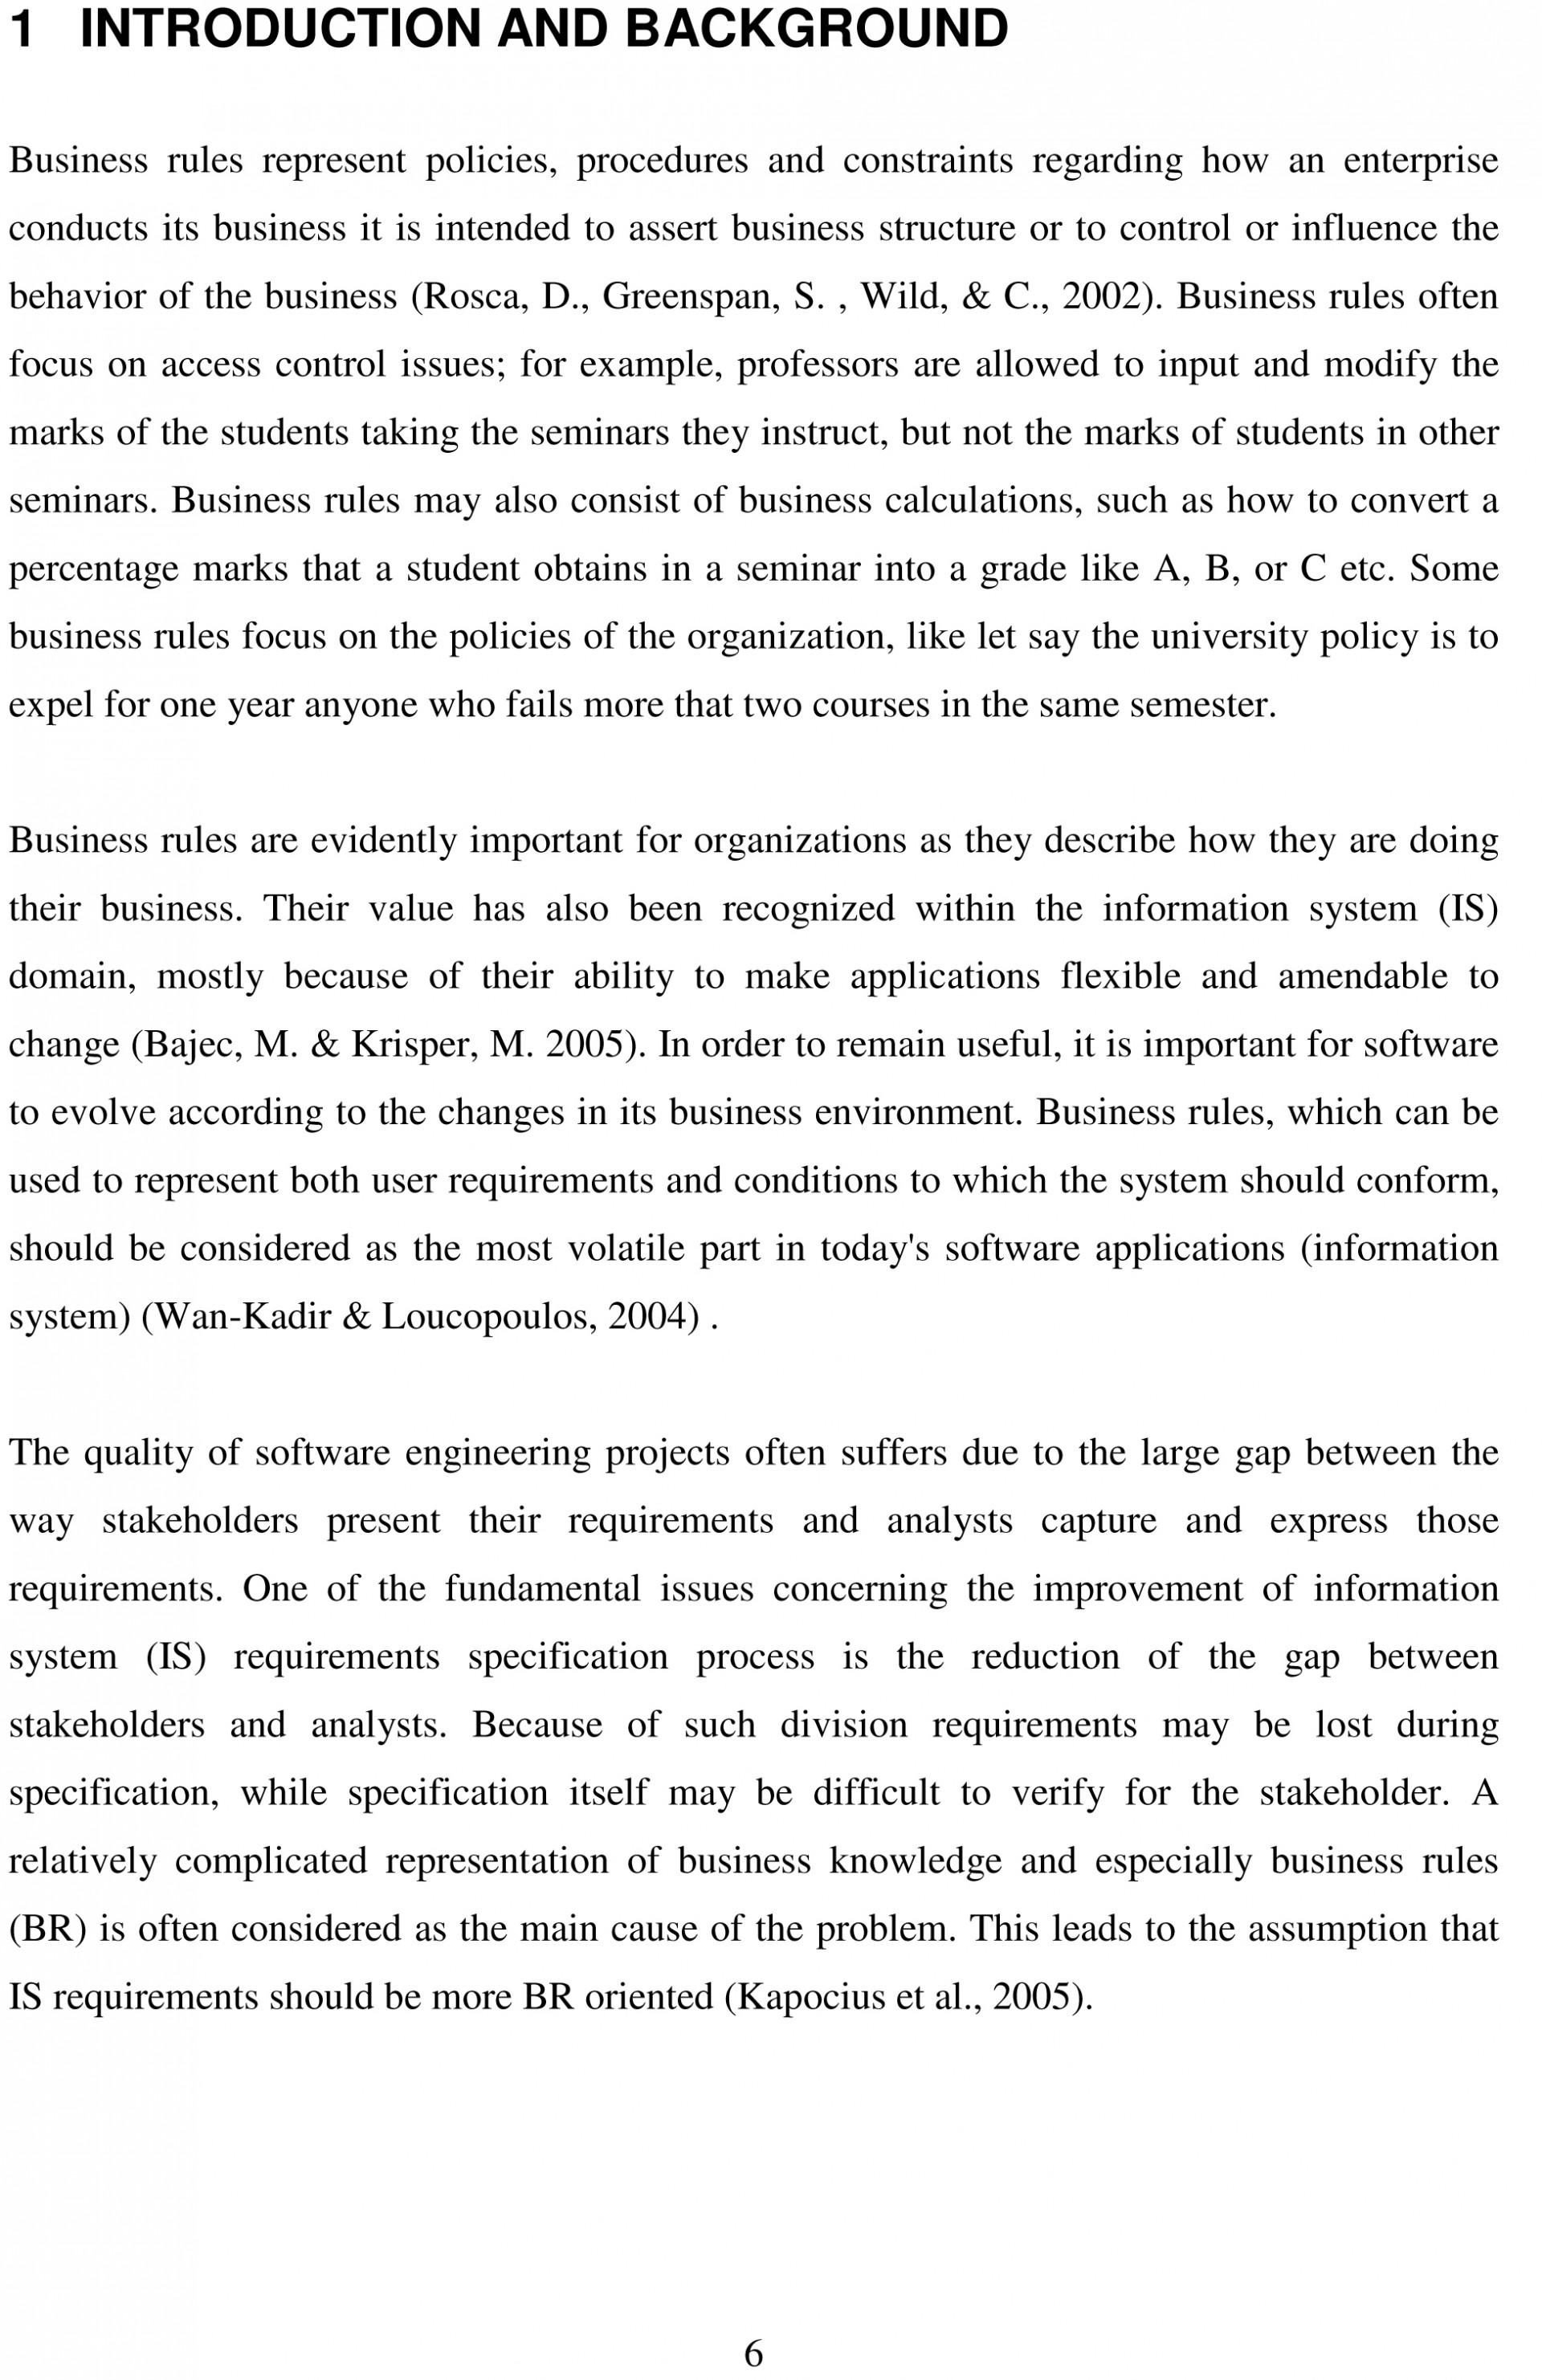 009 Essay Example Thesis Free Sample Breathtaking Lead Exposure Generator 1920